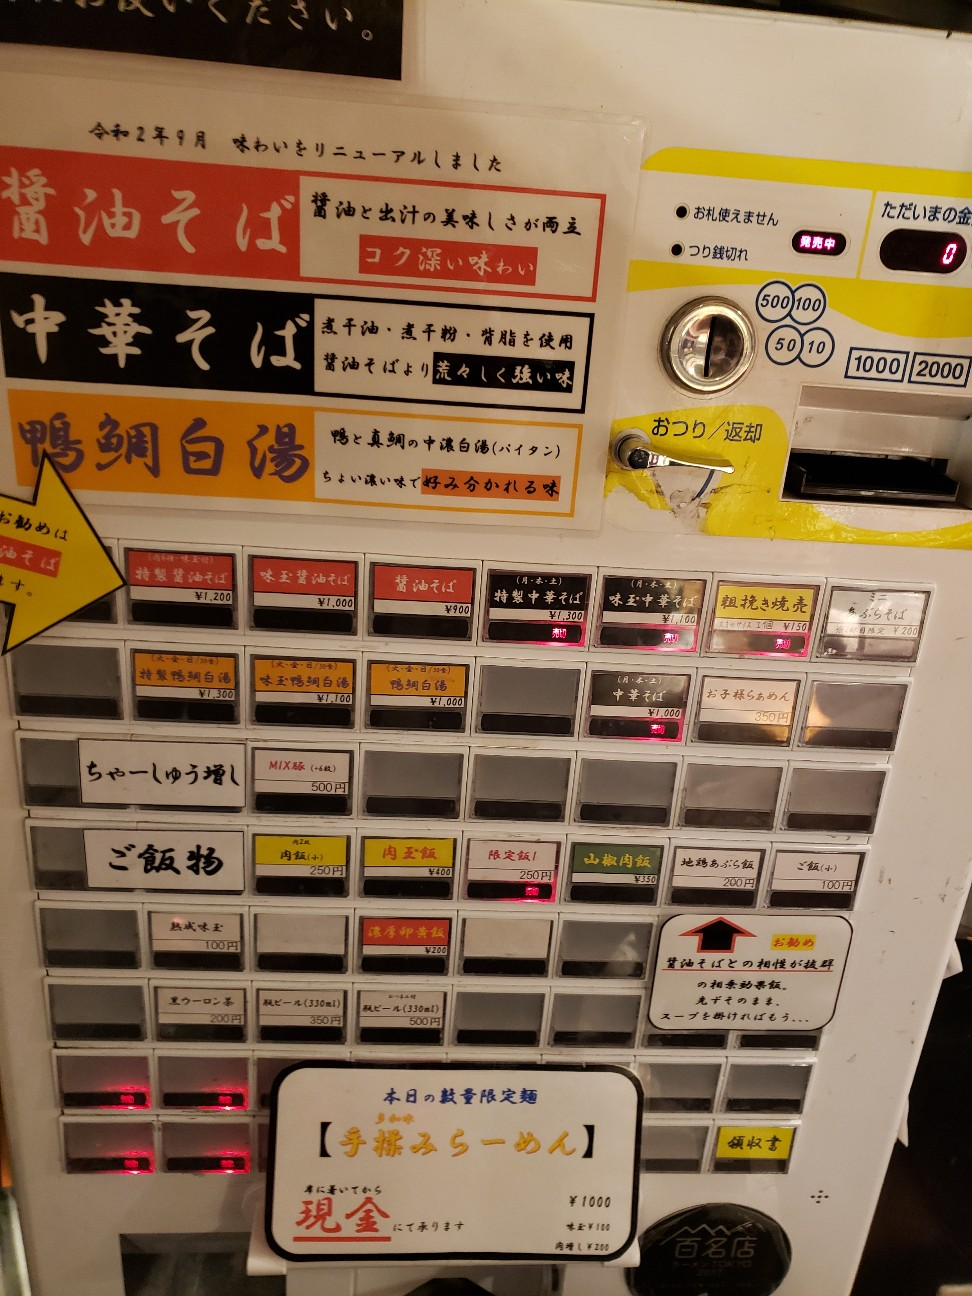 f:id:tt-suzukiit:20201215193030j:image